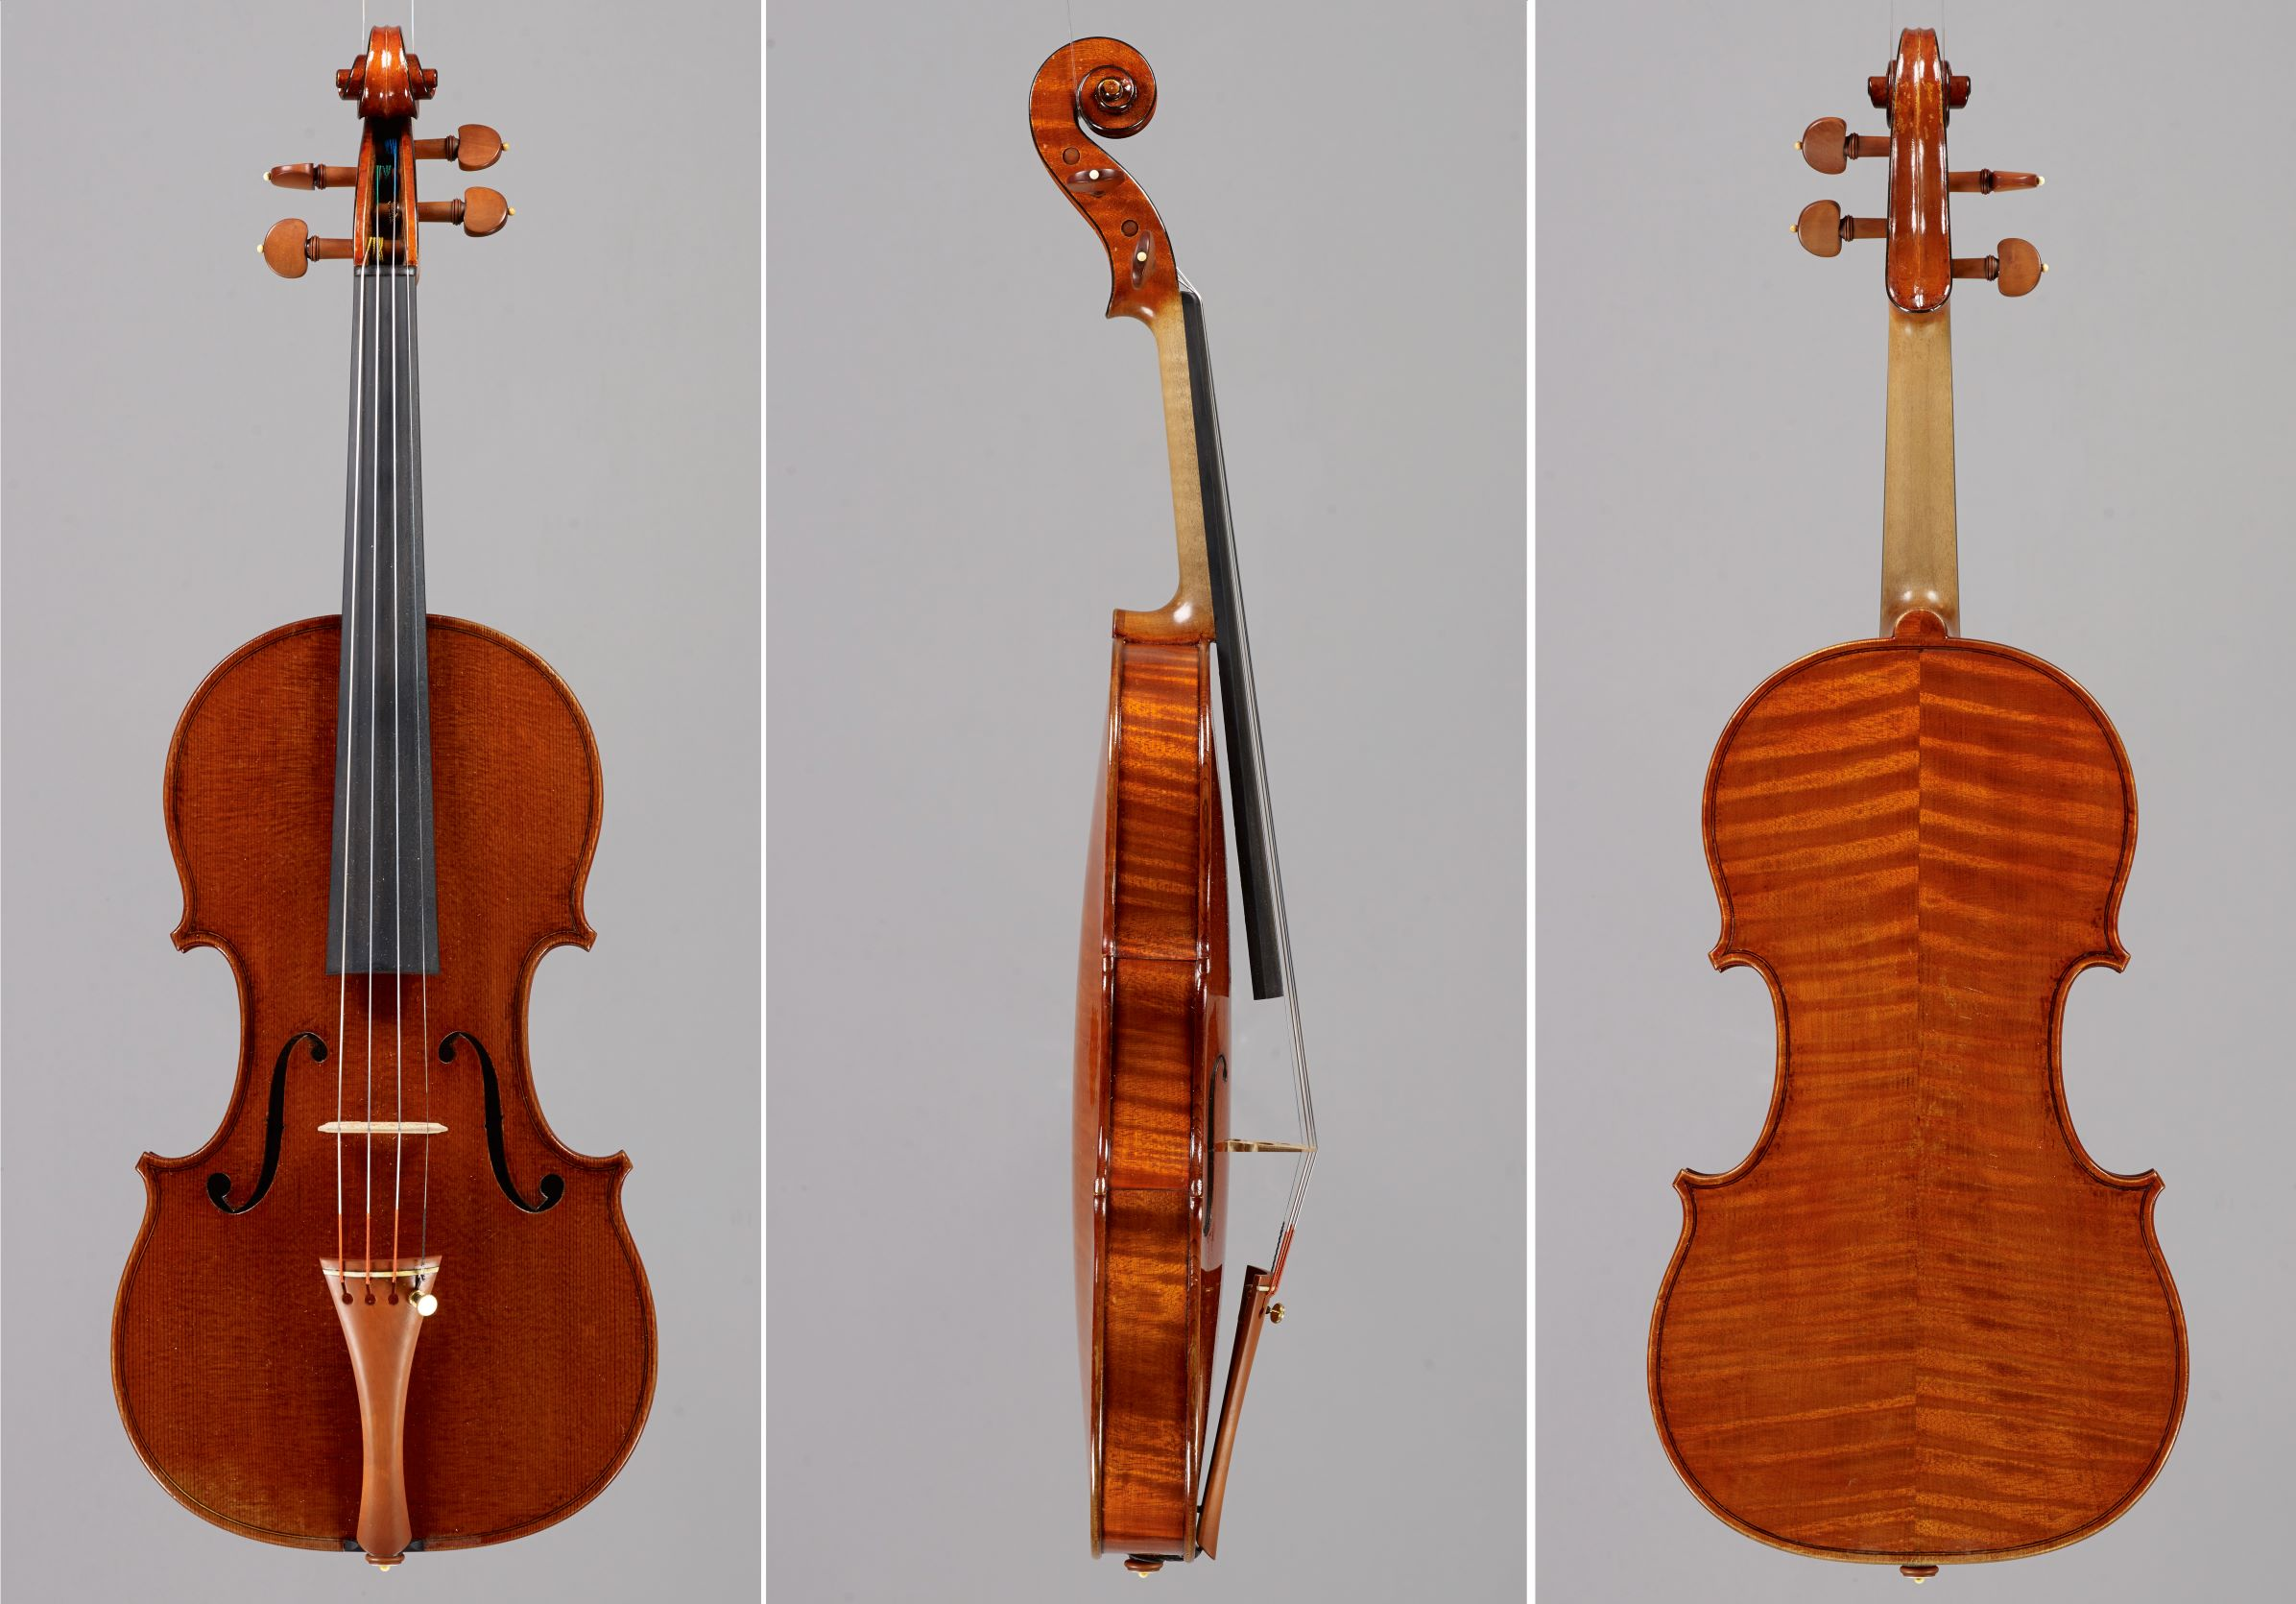 The Hill - 'Messiah' Stradivari Violin